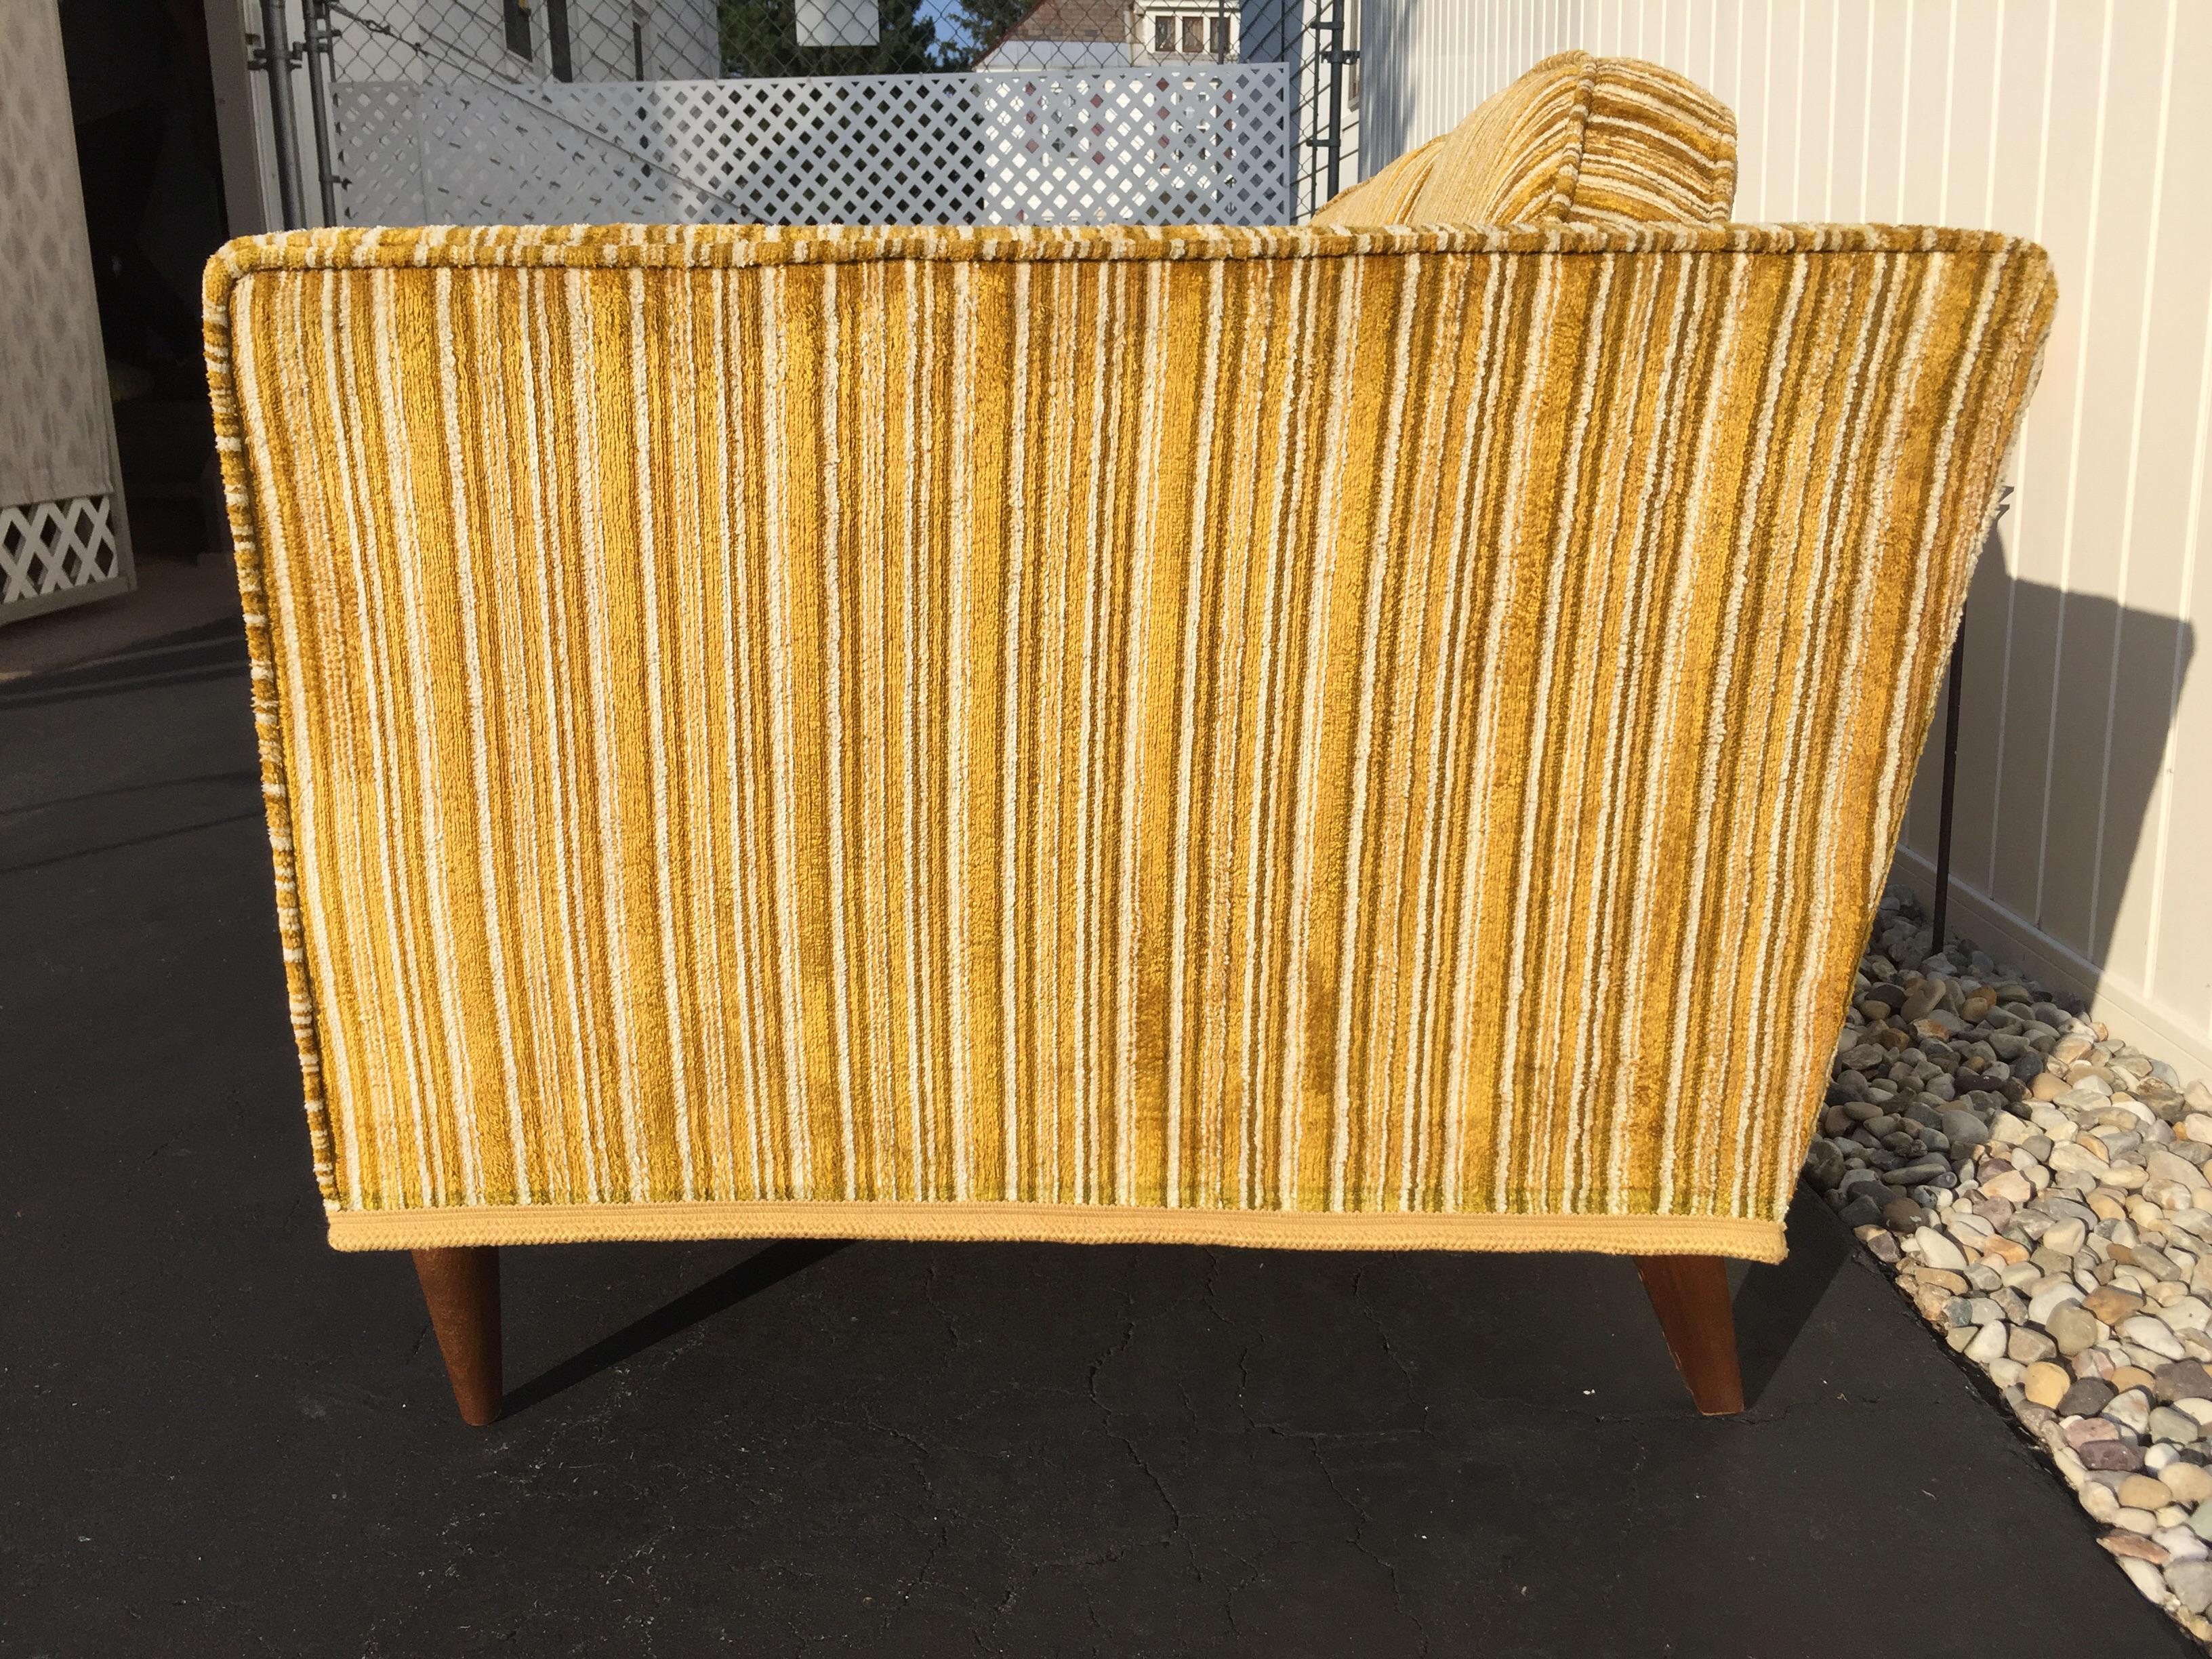 Kroehler Royale Mid Century Gold Striped Sofa   Image 4 Of 11